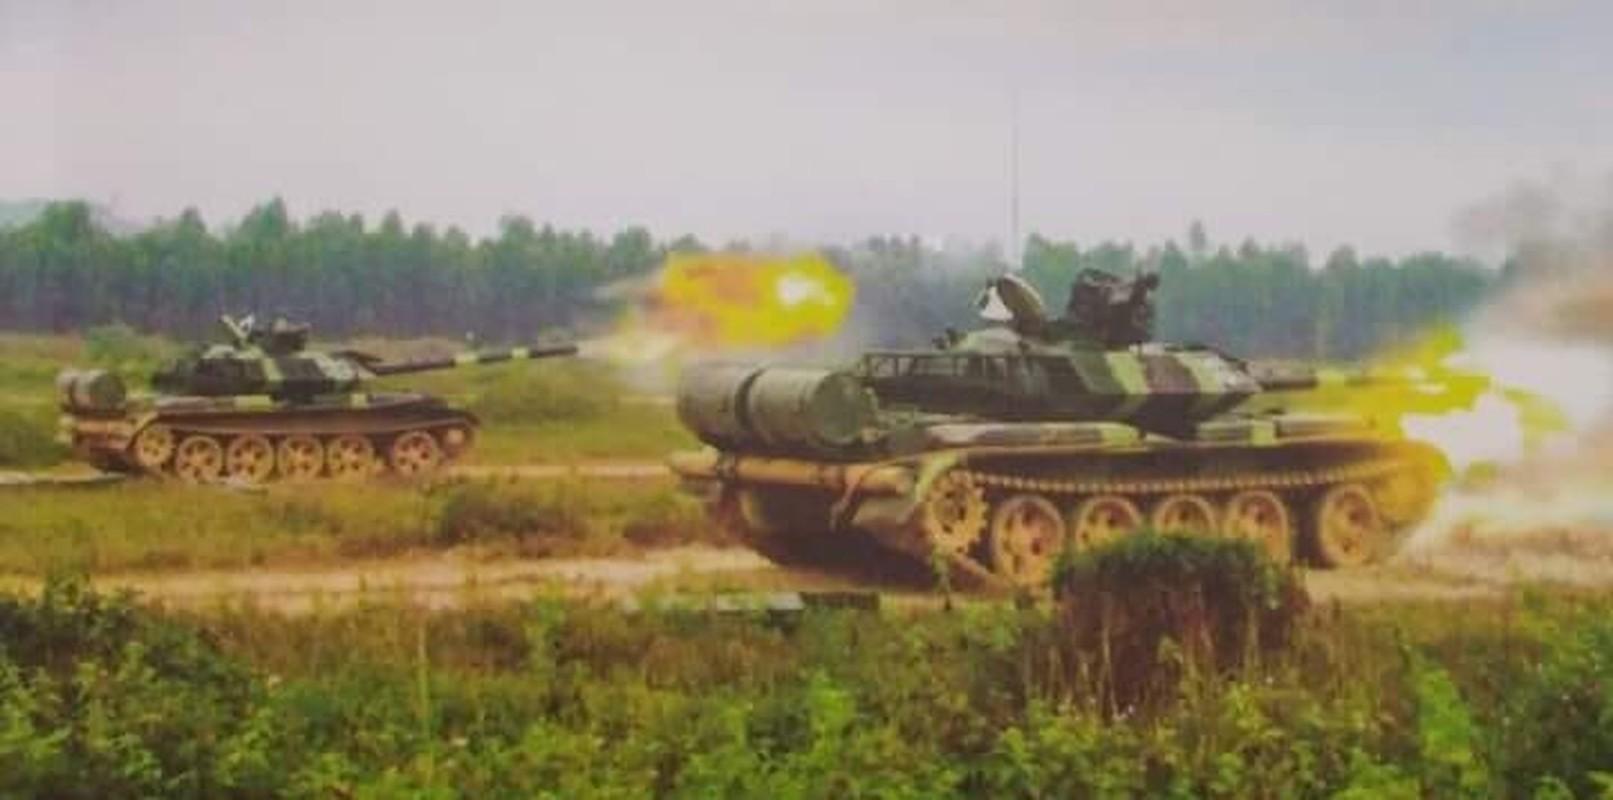 Xe tang T-54M Viet Nam: Ban nang cap uu viet, suc manh tiem can T-72-Hinh-8